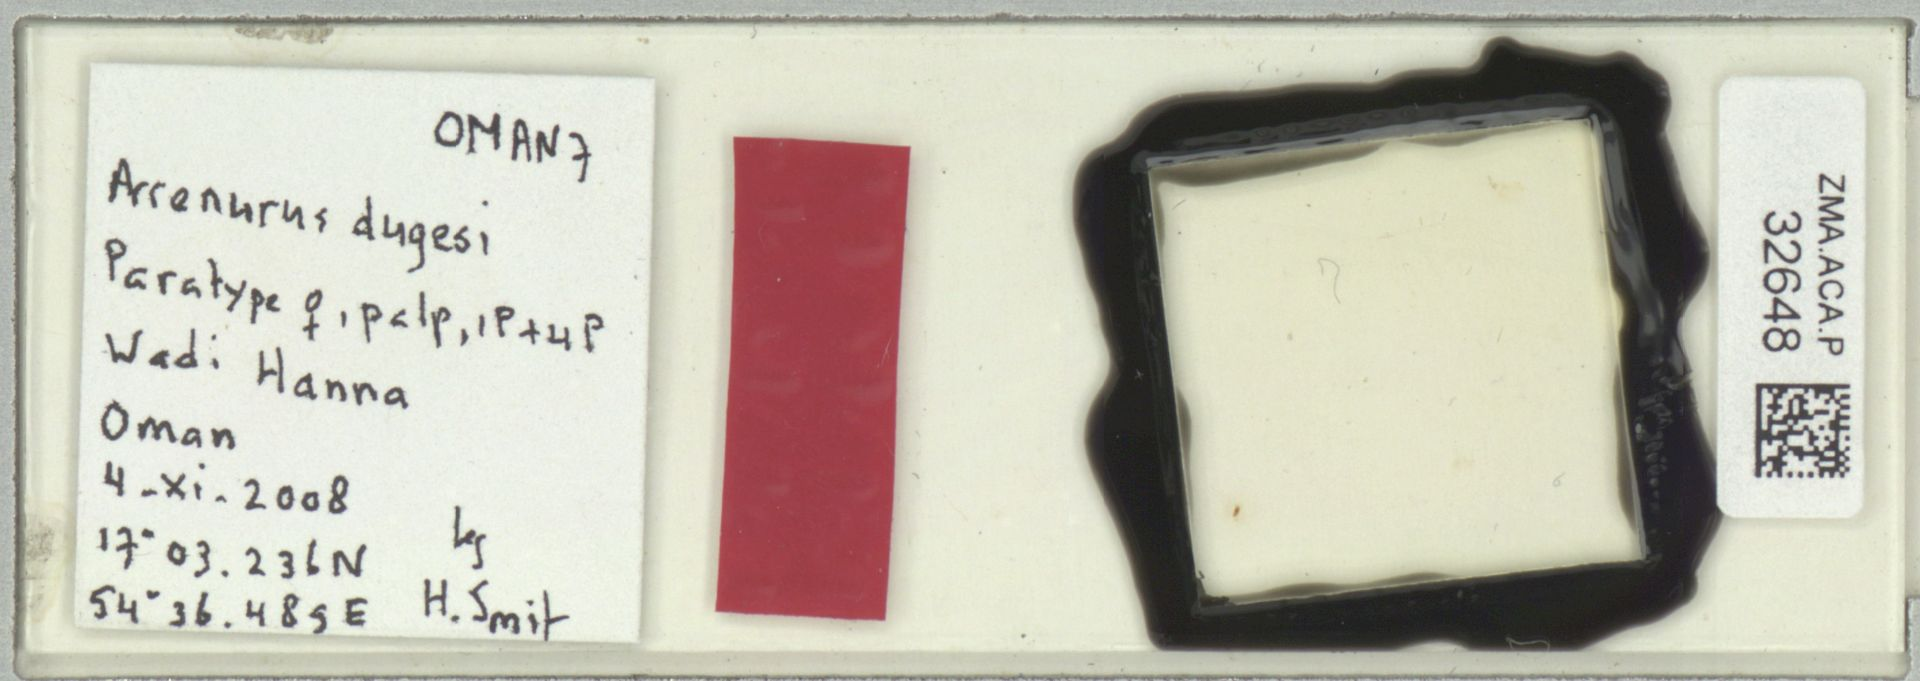 ZMA.ACA.P.32648 | Arrenurus dugesi Smit & Pesic, 2010